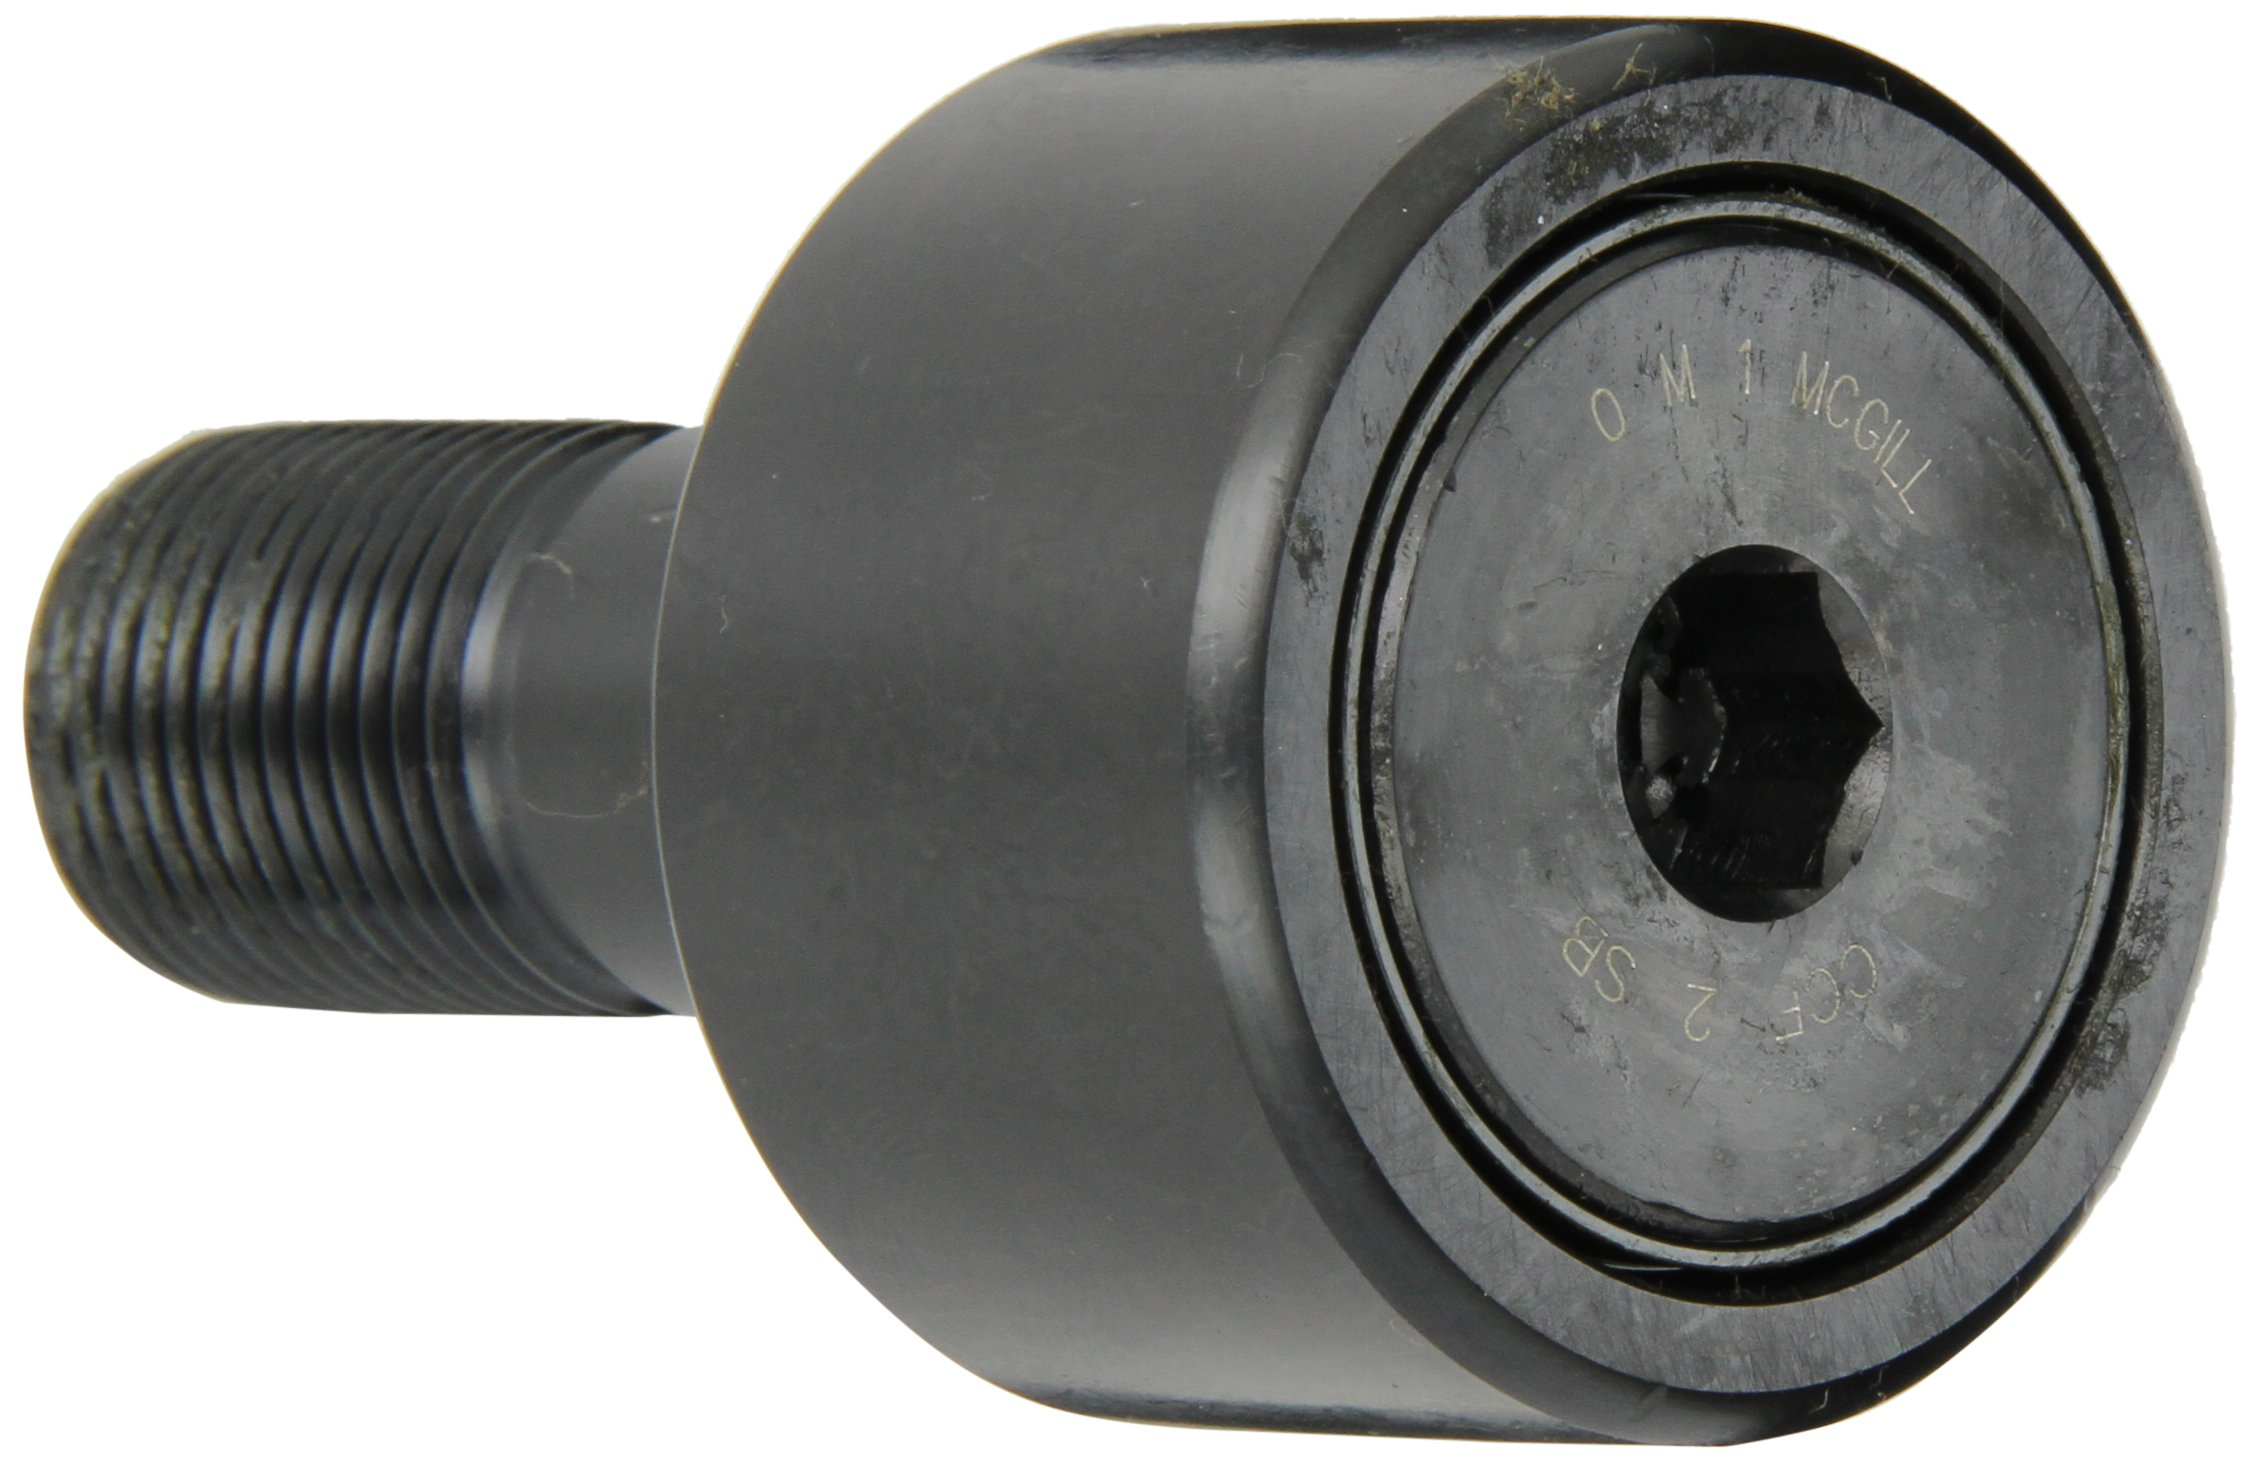 "McGill CCF2SB Cam Follower, Crowned, Sealed, Inch, Steel, 2"" Roller Diameter, 1-1/4"" Roller Width, 2"" Stud Length, 7/8"" Thread Size, 3-9/32"" Overall Length, 0.875"" Stud Diameter"